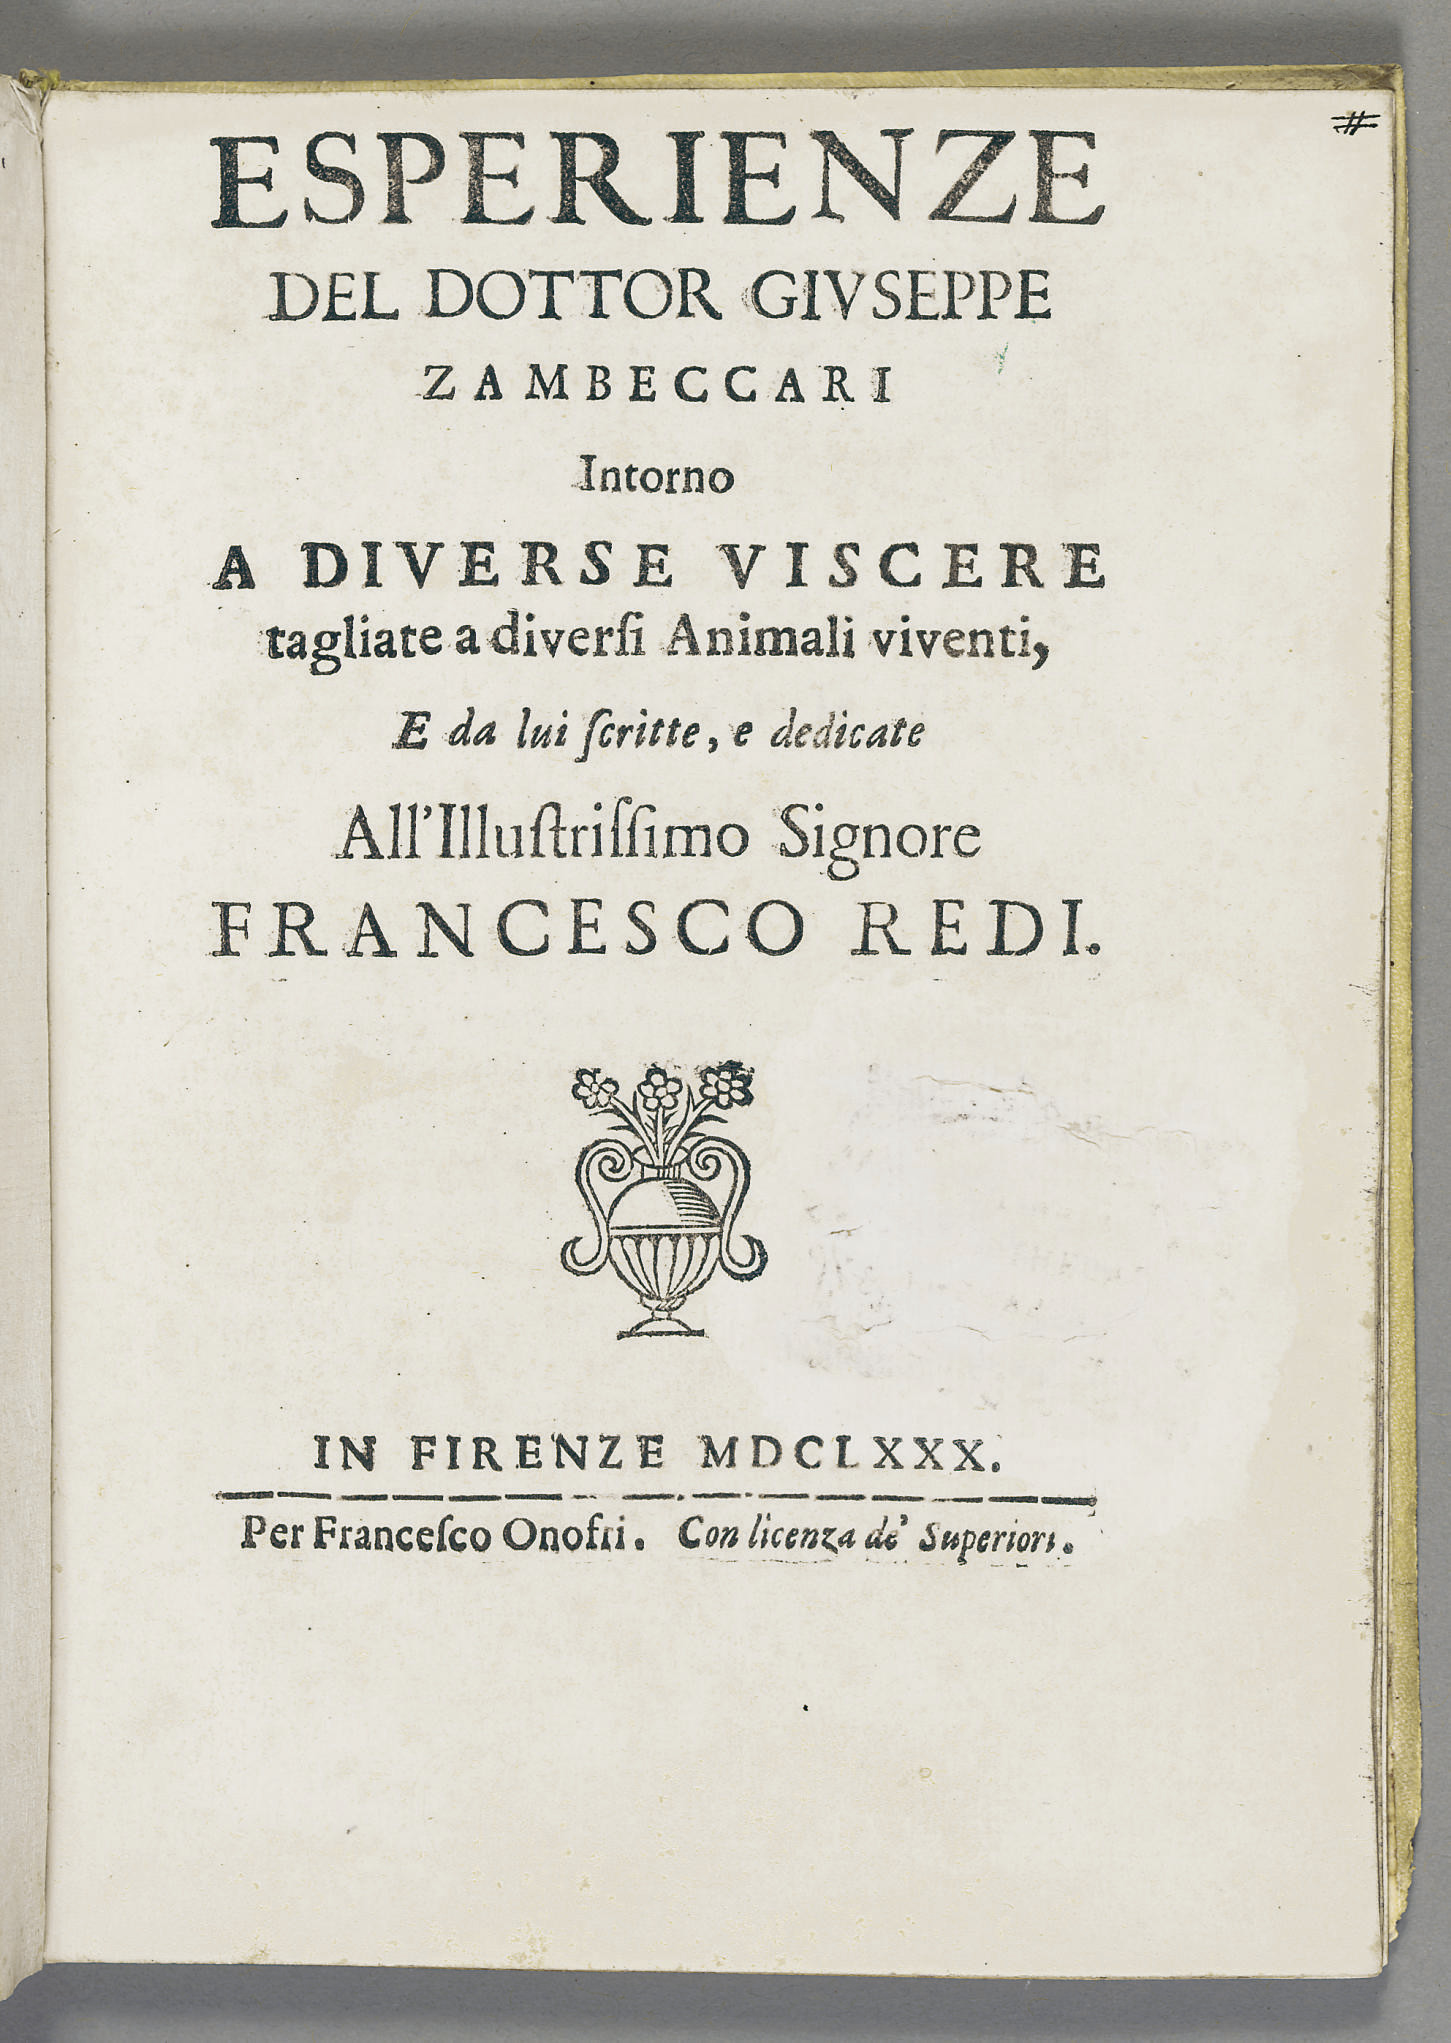 ZAMBECCARI, Giuseppe (1655-172